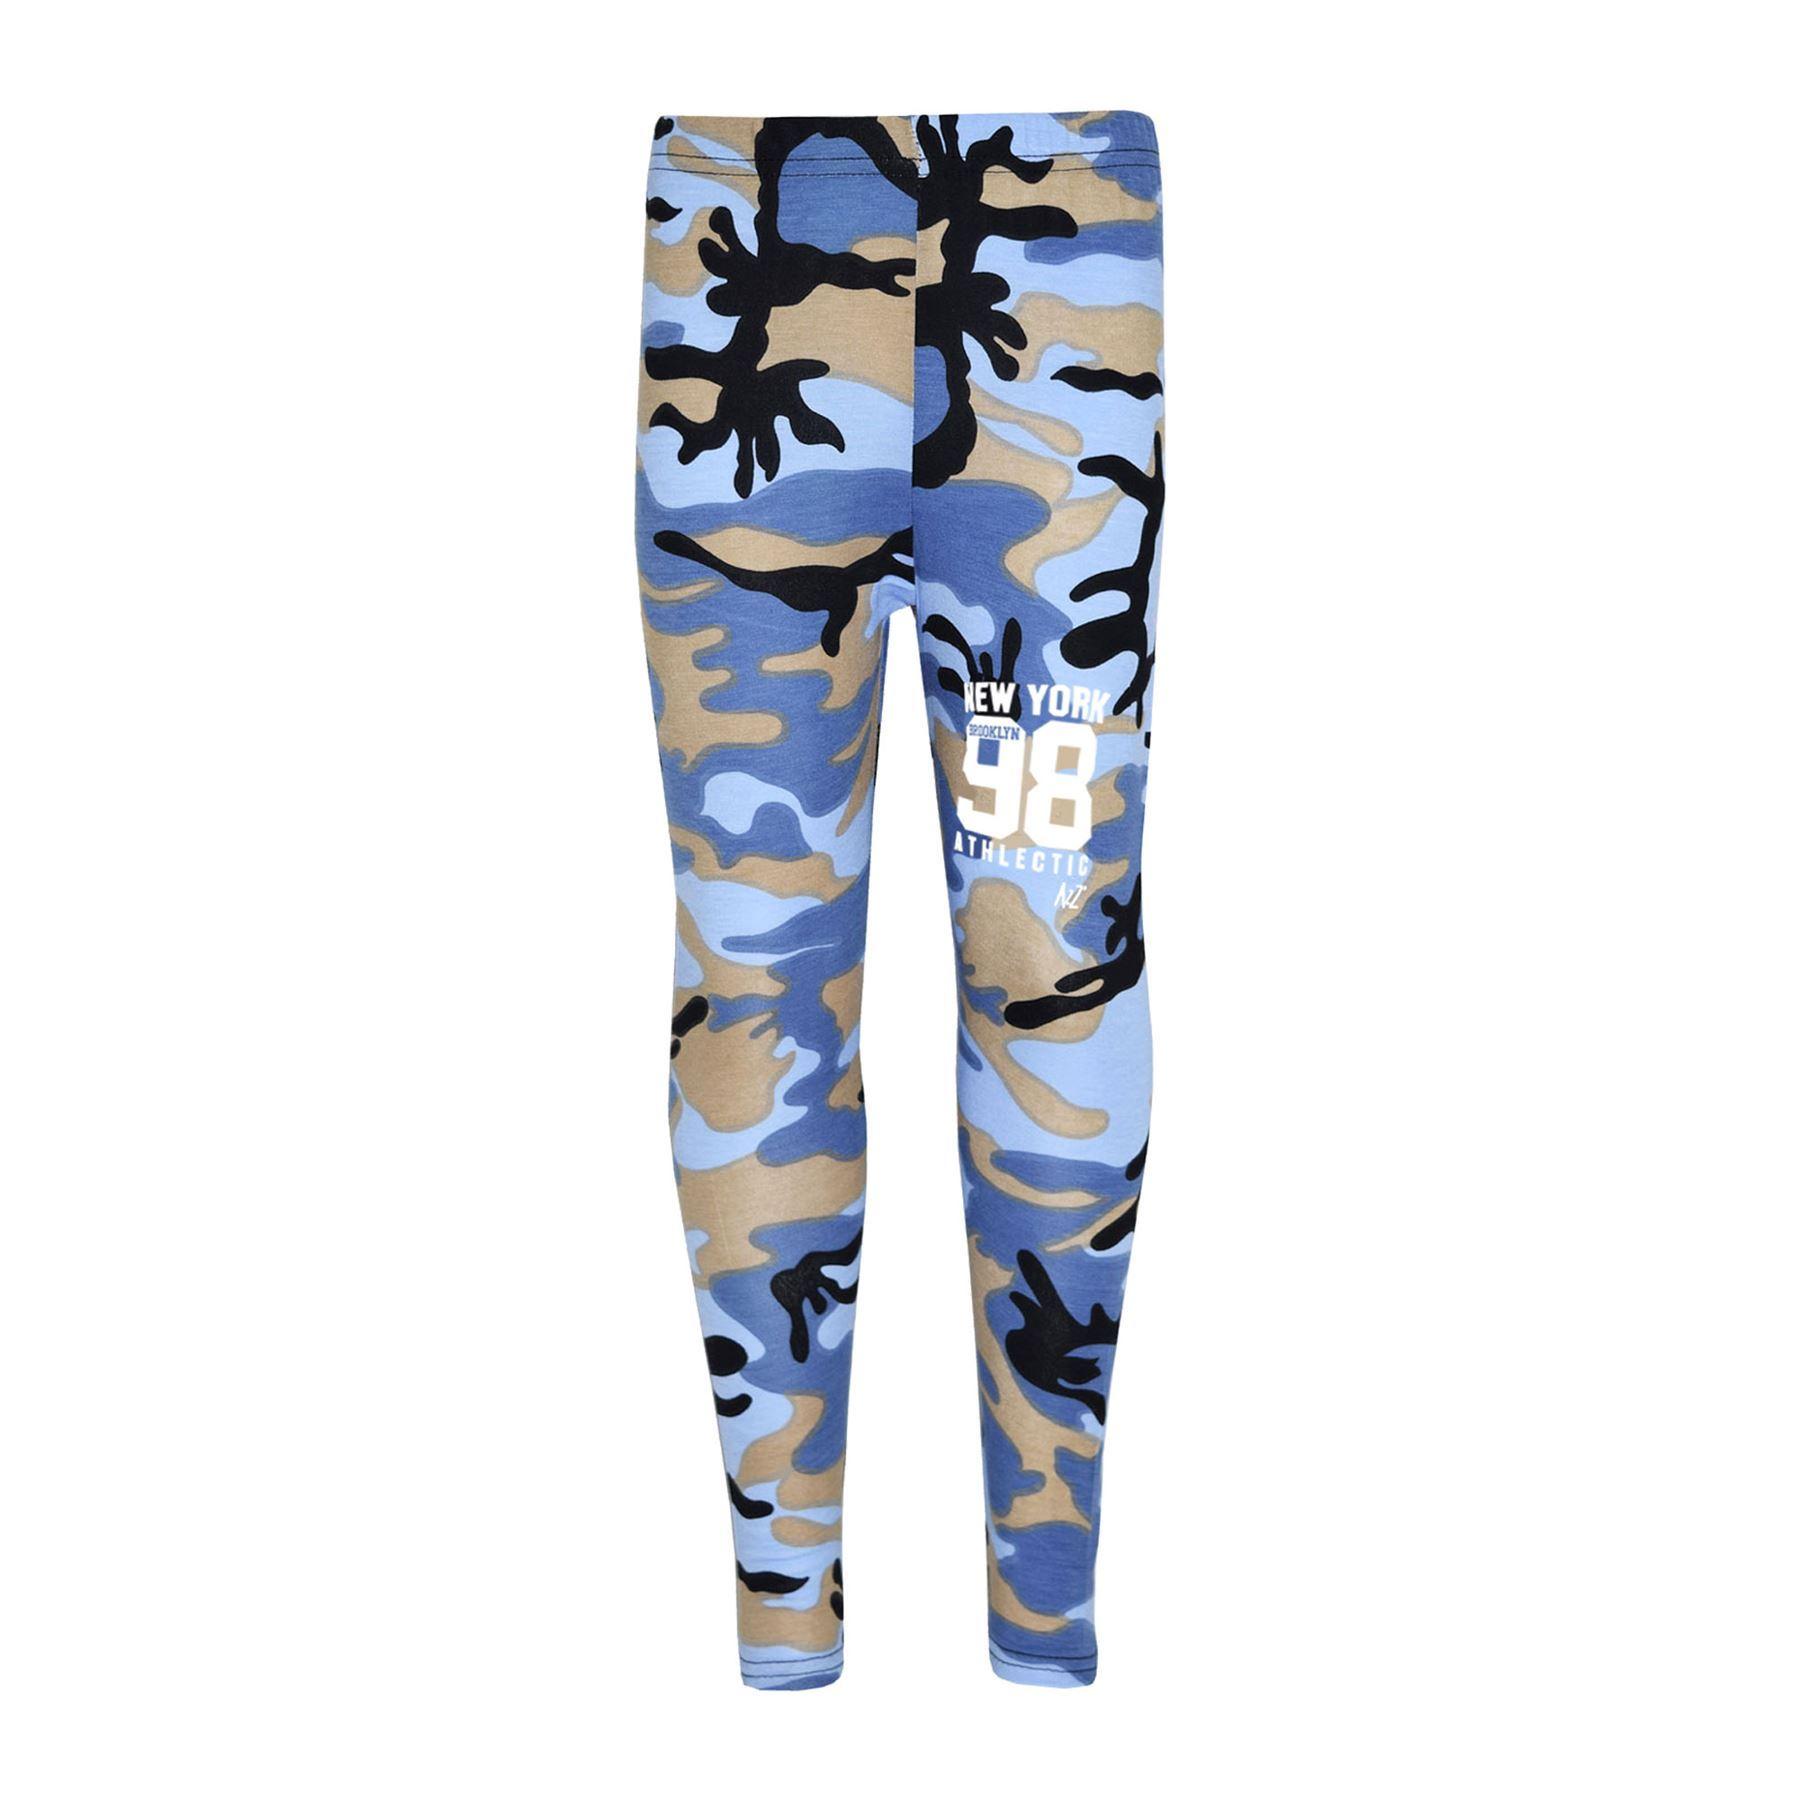 Girls-NEW-YORK-BROOKLYN-98-ATHLECTIC-Camouflage-Print-Top-amp-Legging-Set-7-13-Yr thumbnail 15